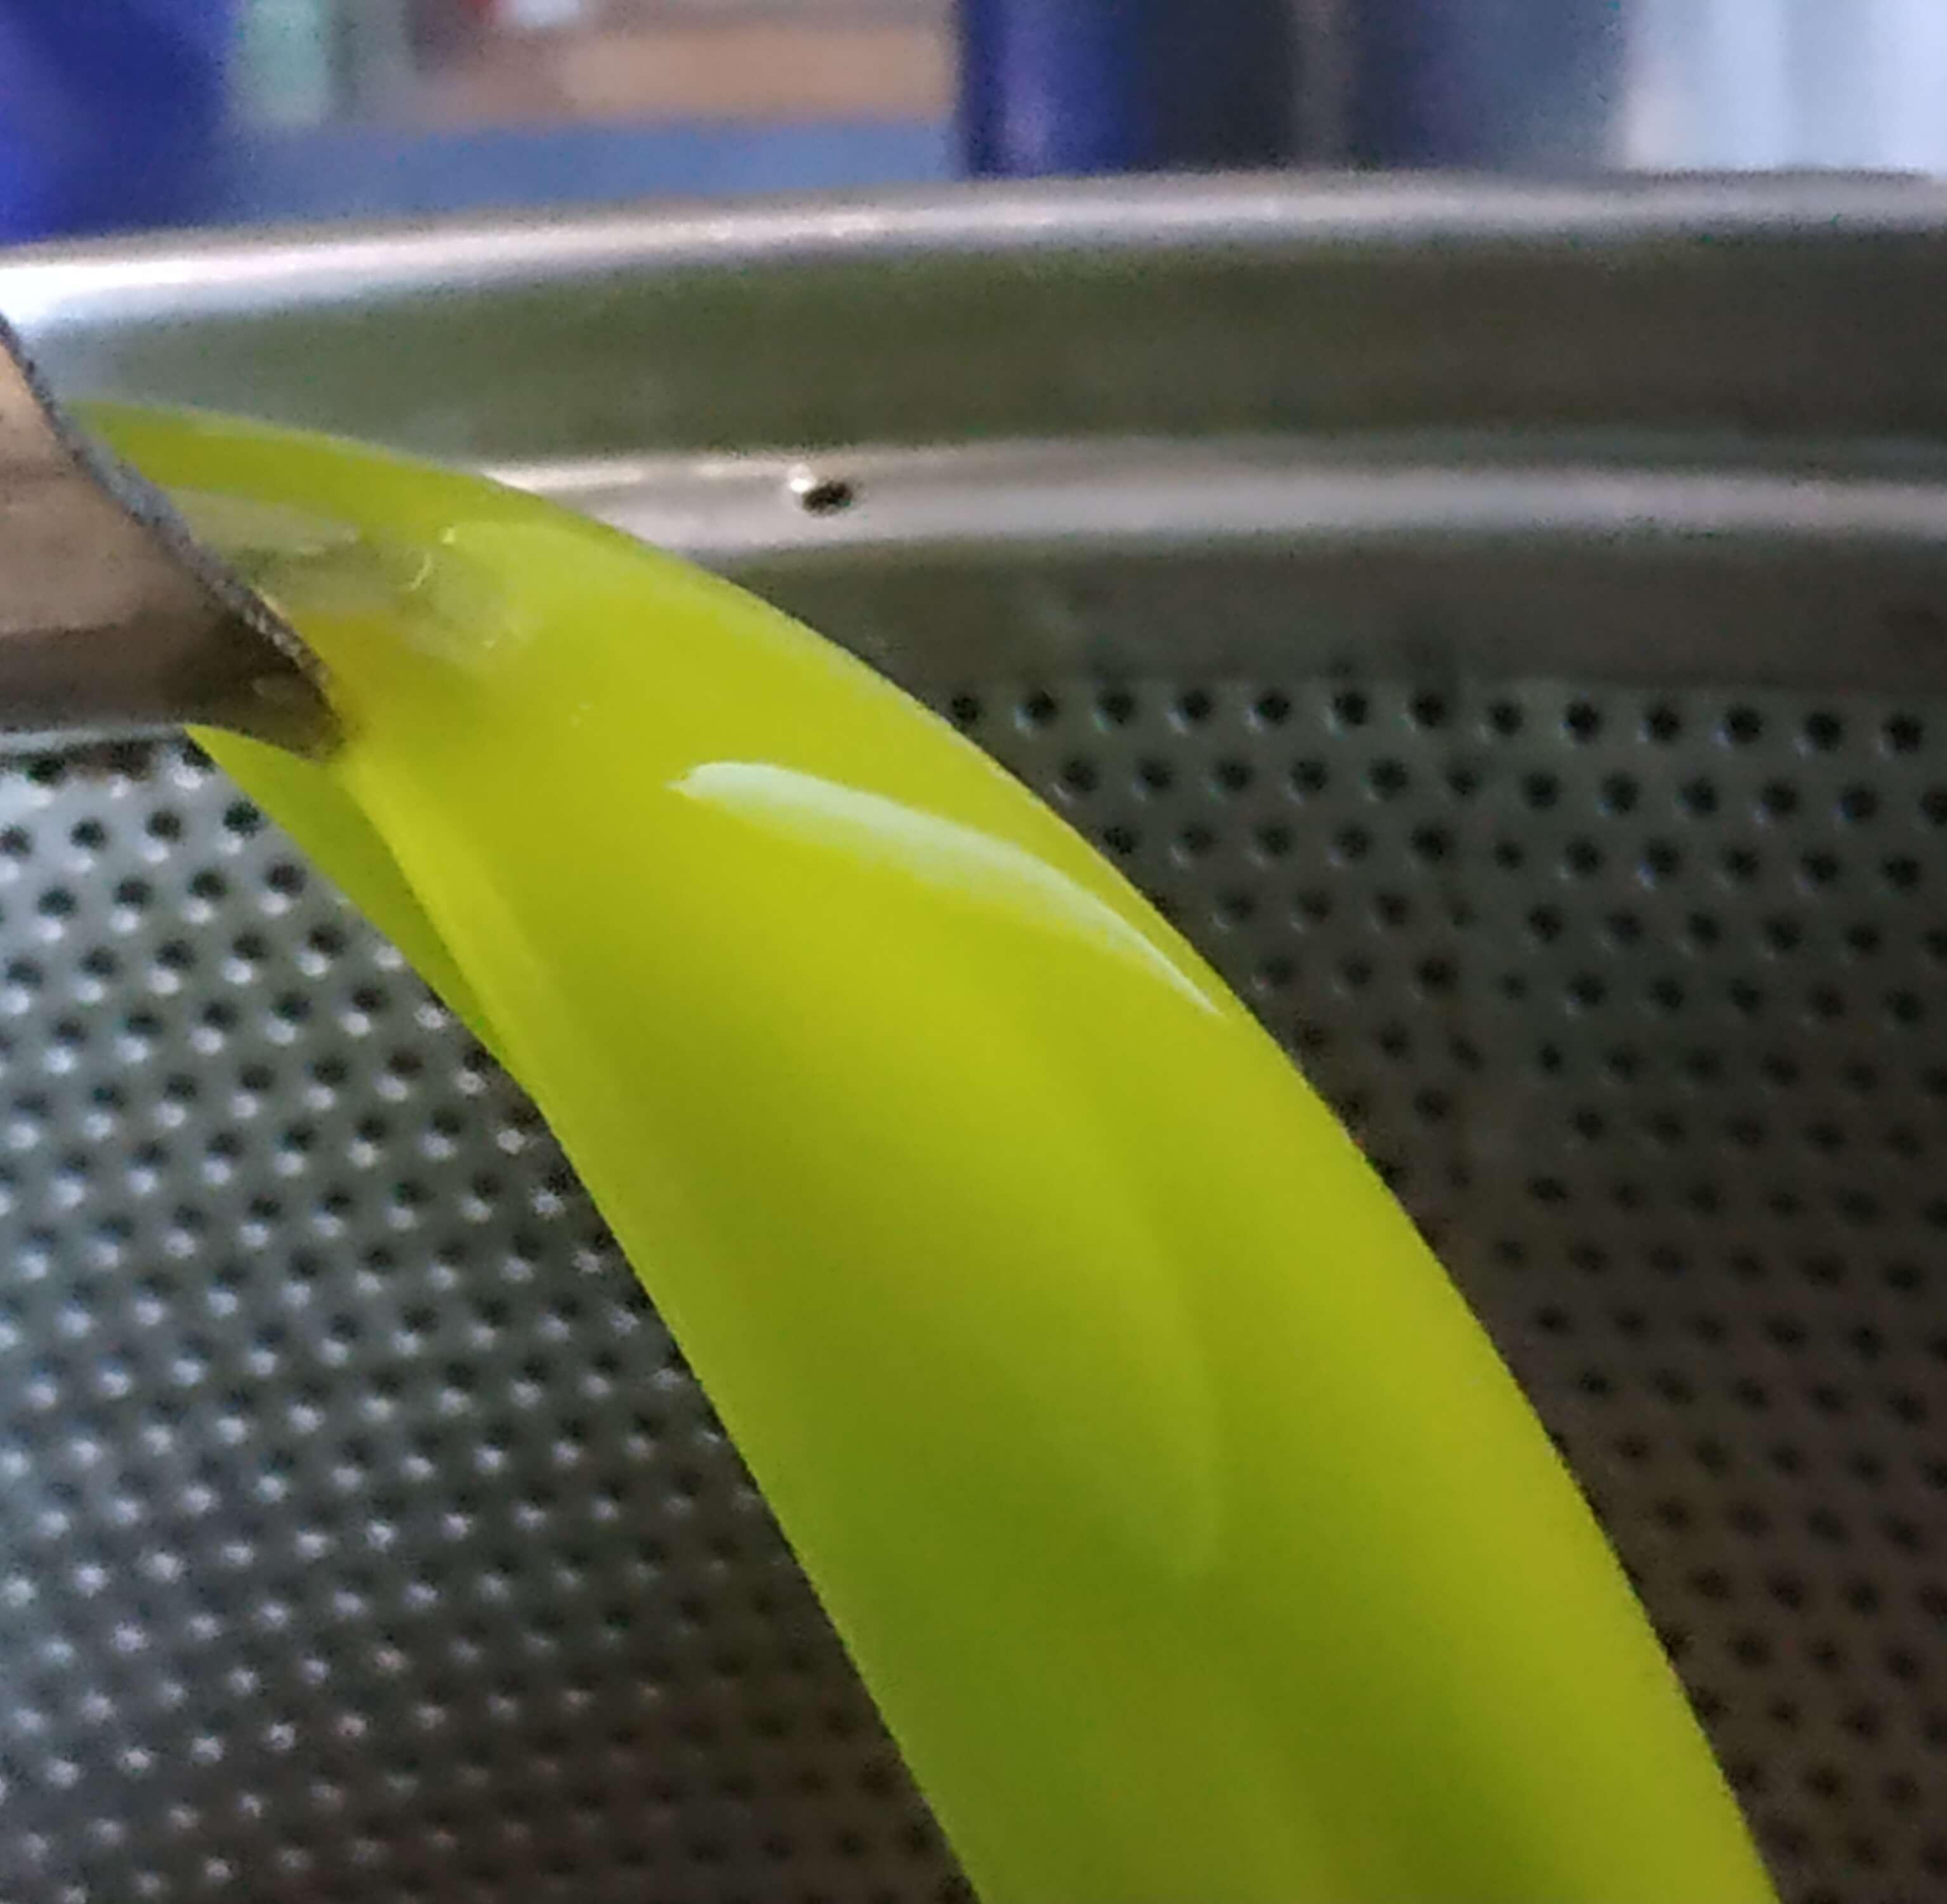 sakellaropoulos organic farming gourmet functional greek record olive oil awards worldwide